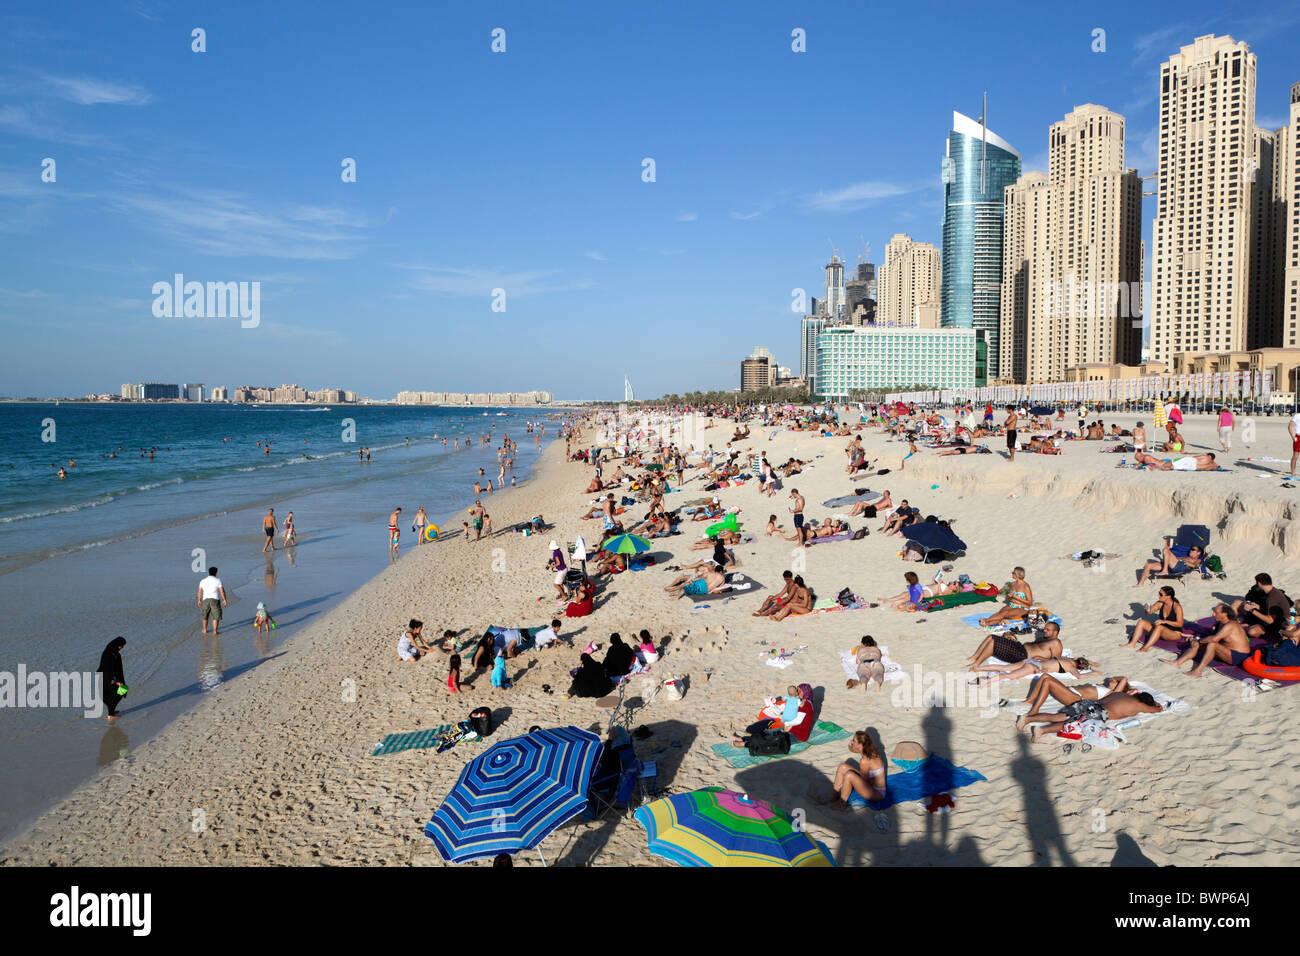 Jumeirah Beach, Dubai - Stock Image